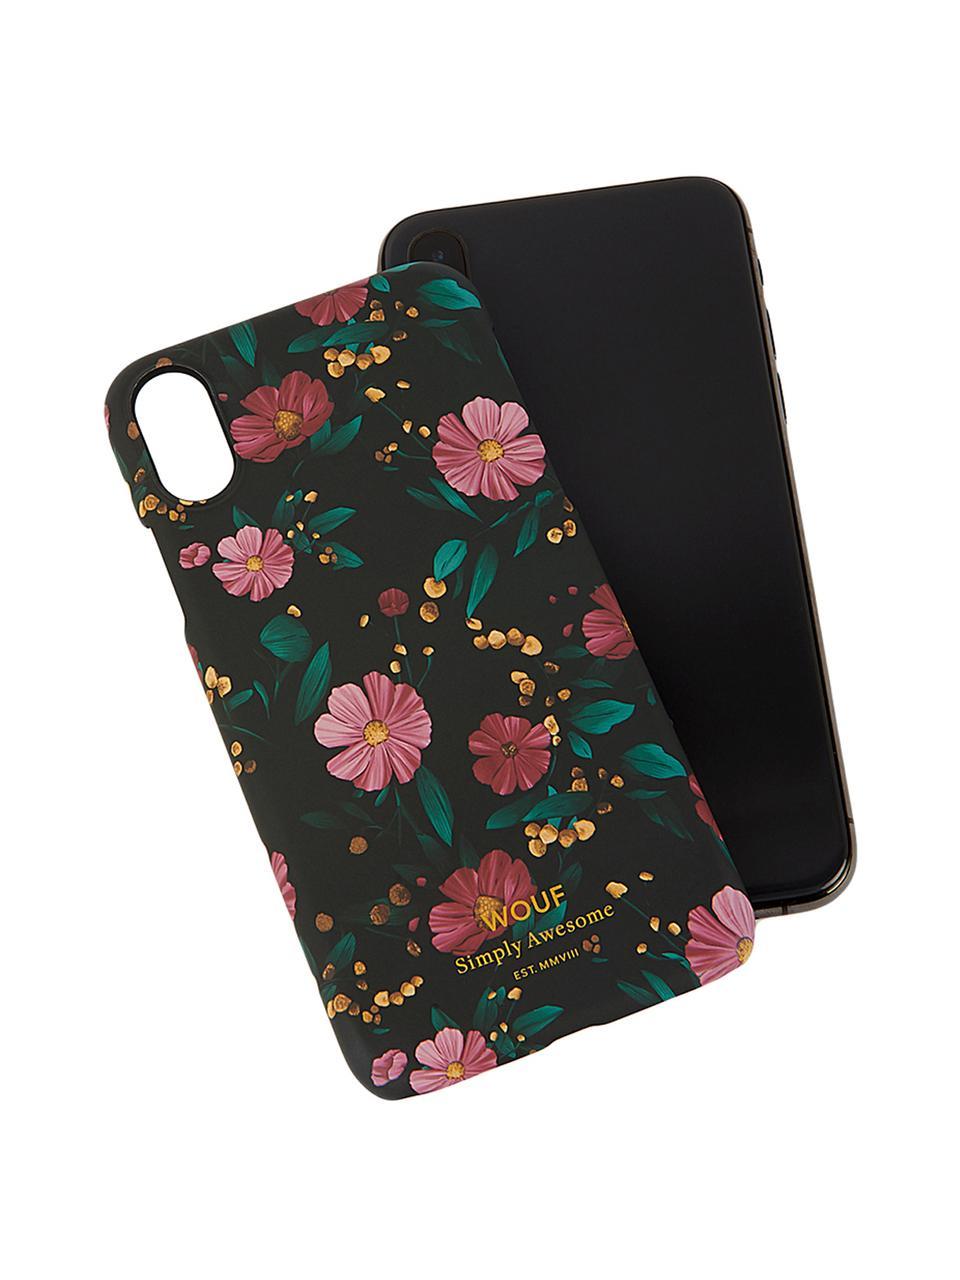 Hülle Black Flowers für iPhone X, Silikon, Schwarz, Mehrfarbig, 7 x 15 cm